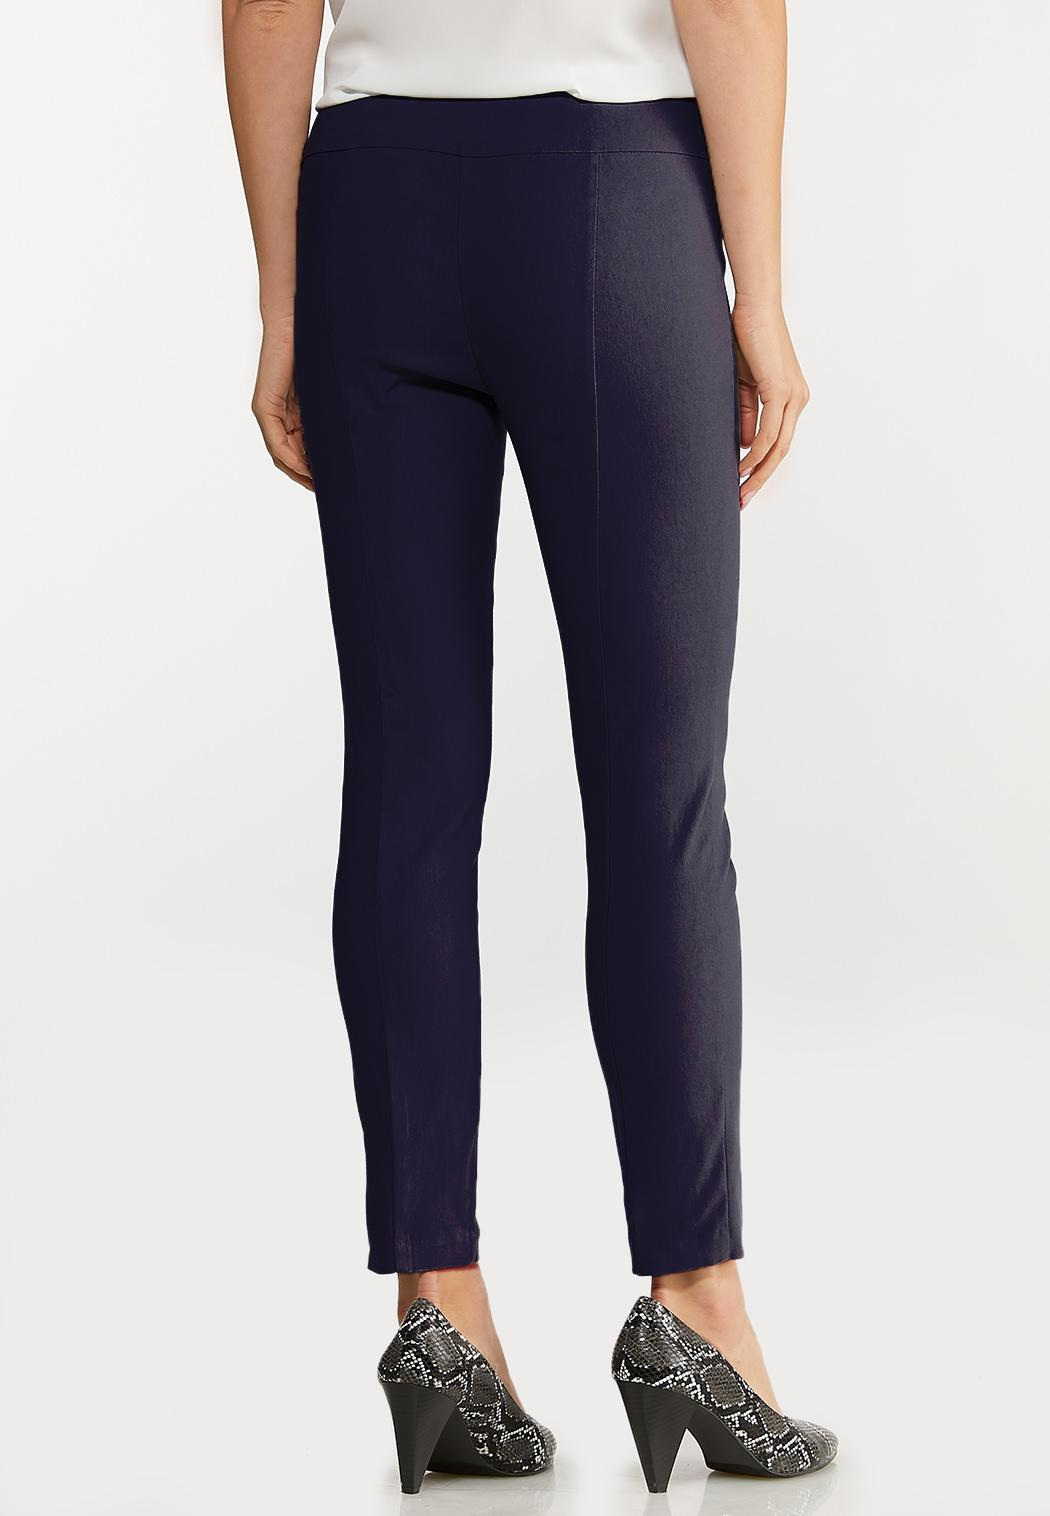 Petite Bengaline Ankle Pants (Item #44109057)